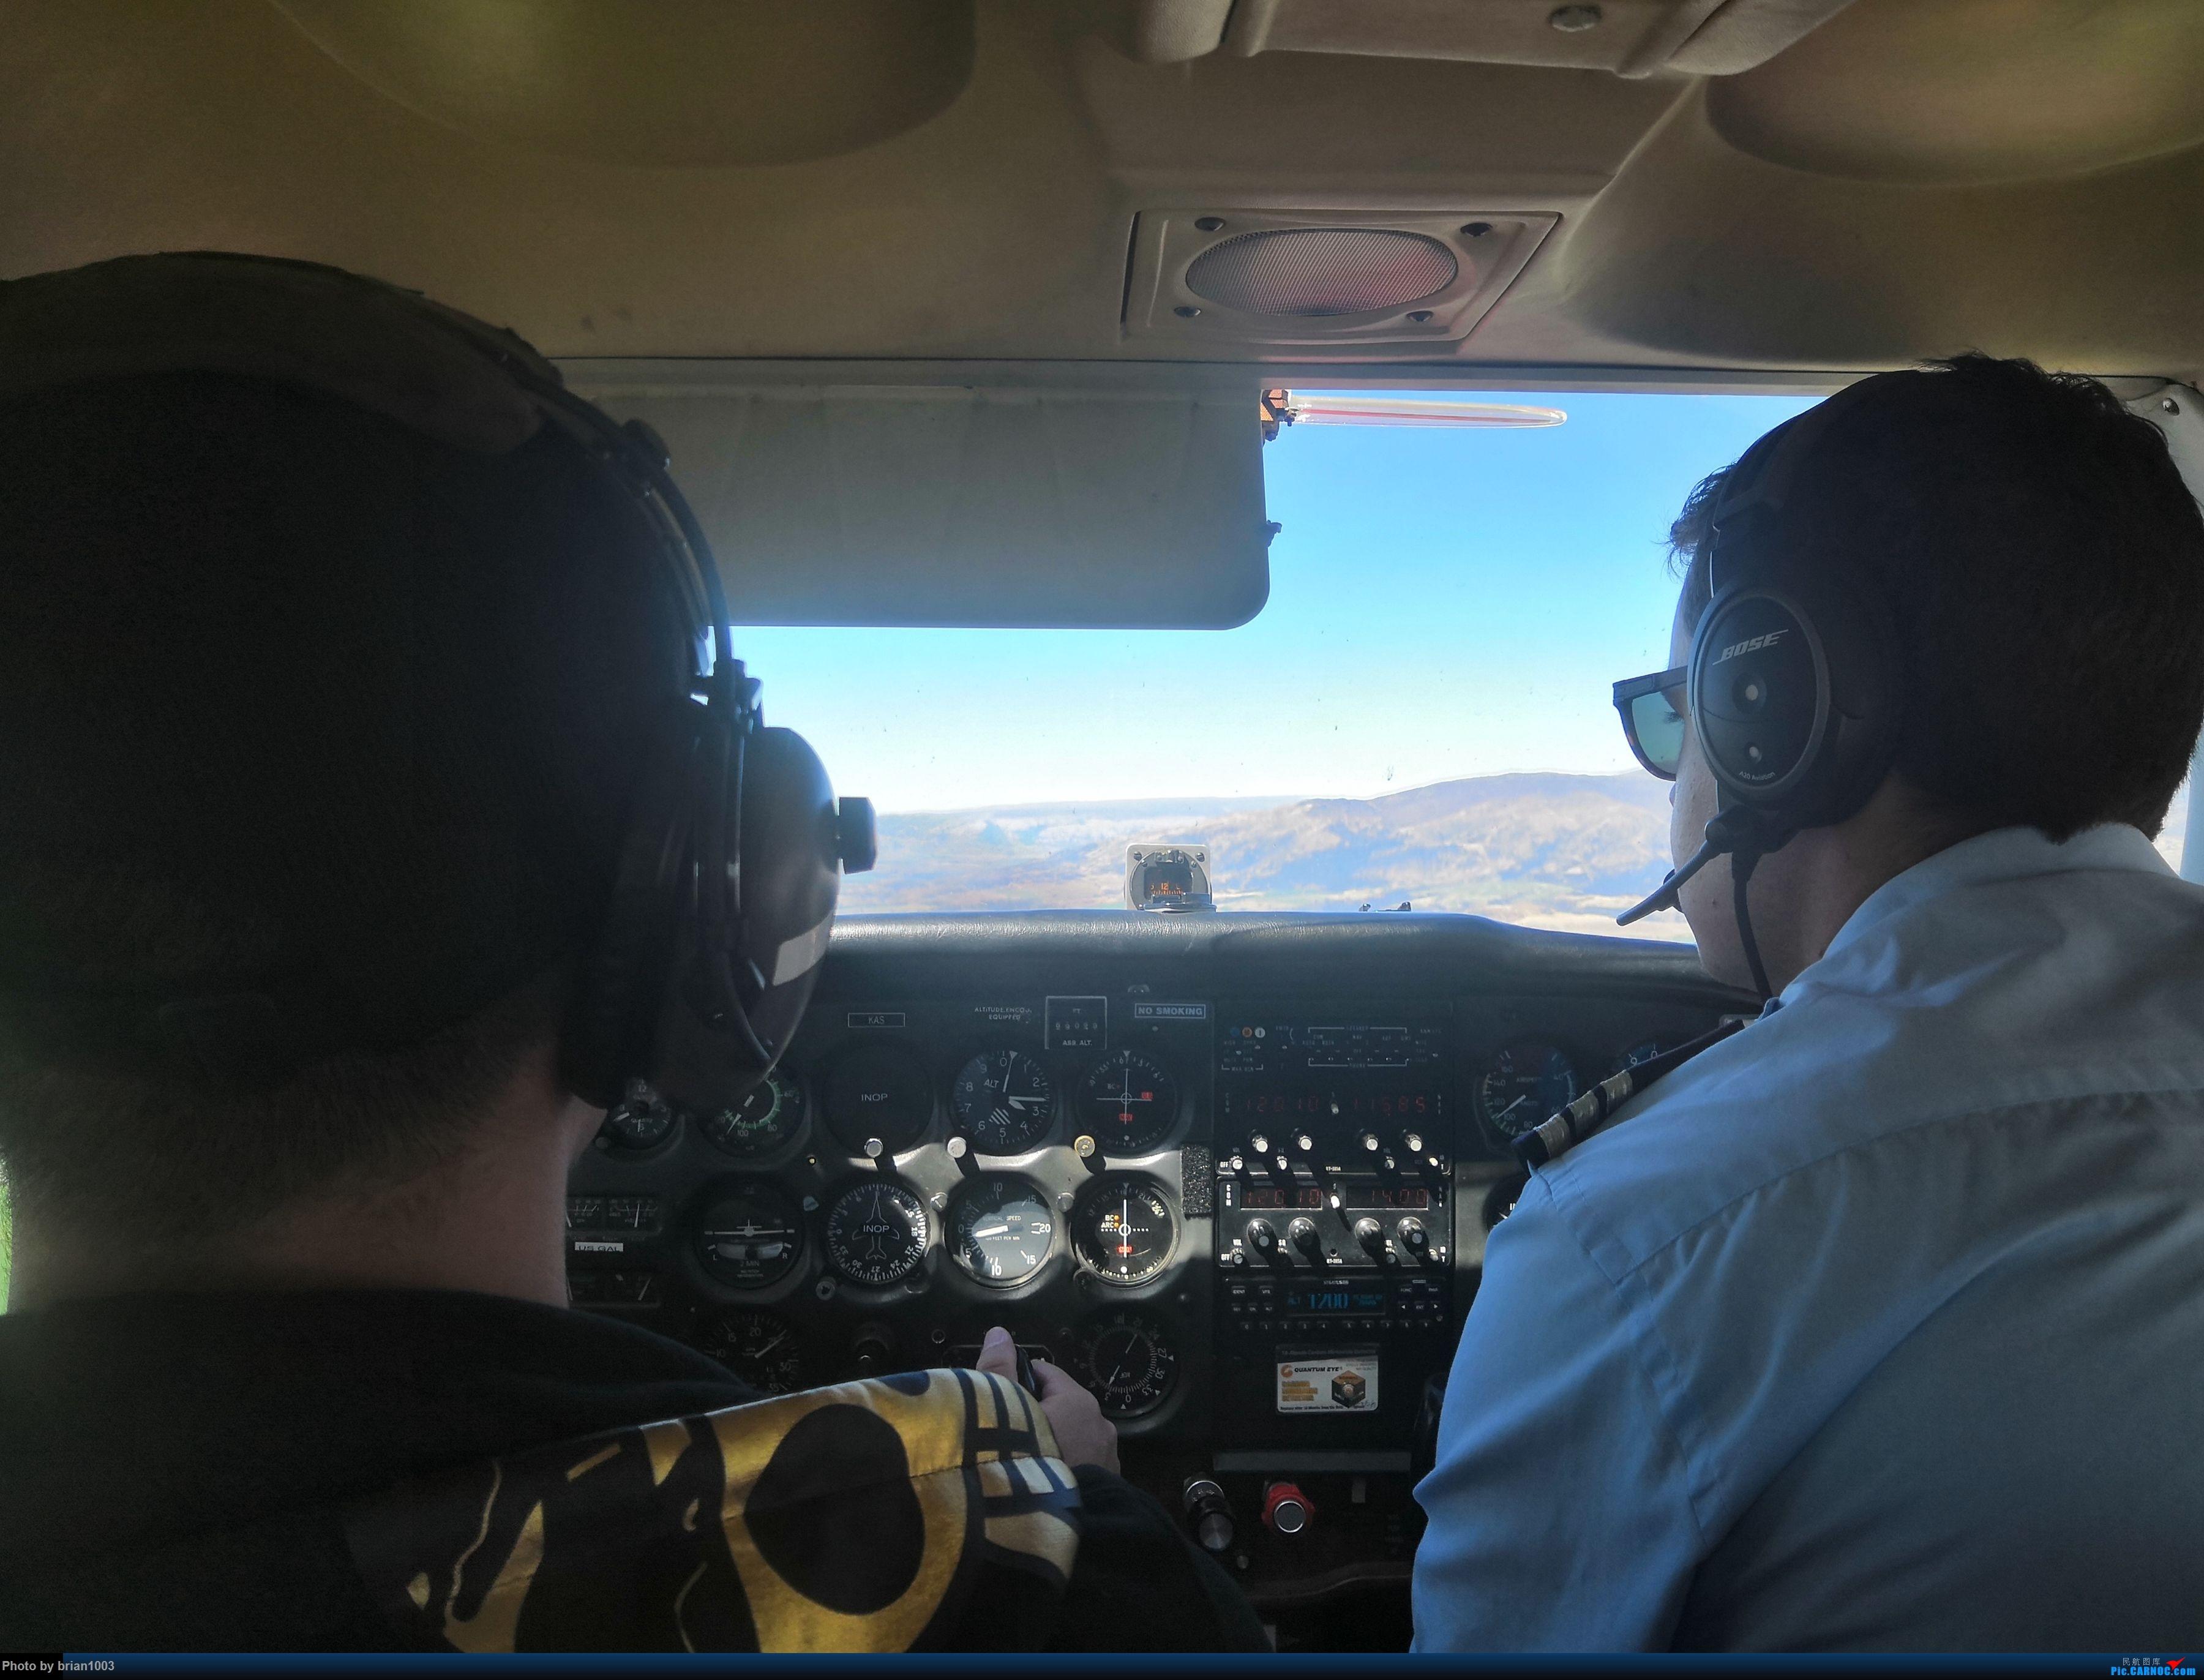 Re:[原创]CZ3347-CZ617-JQ292-CZ306-CZ659,中土之国屌丝舱自驾流水账